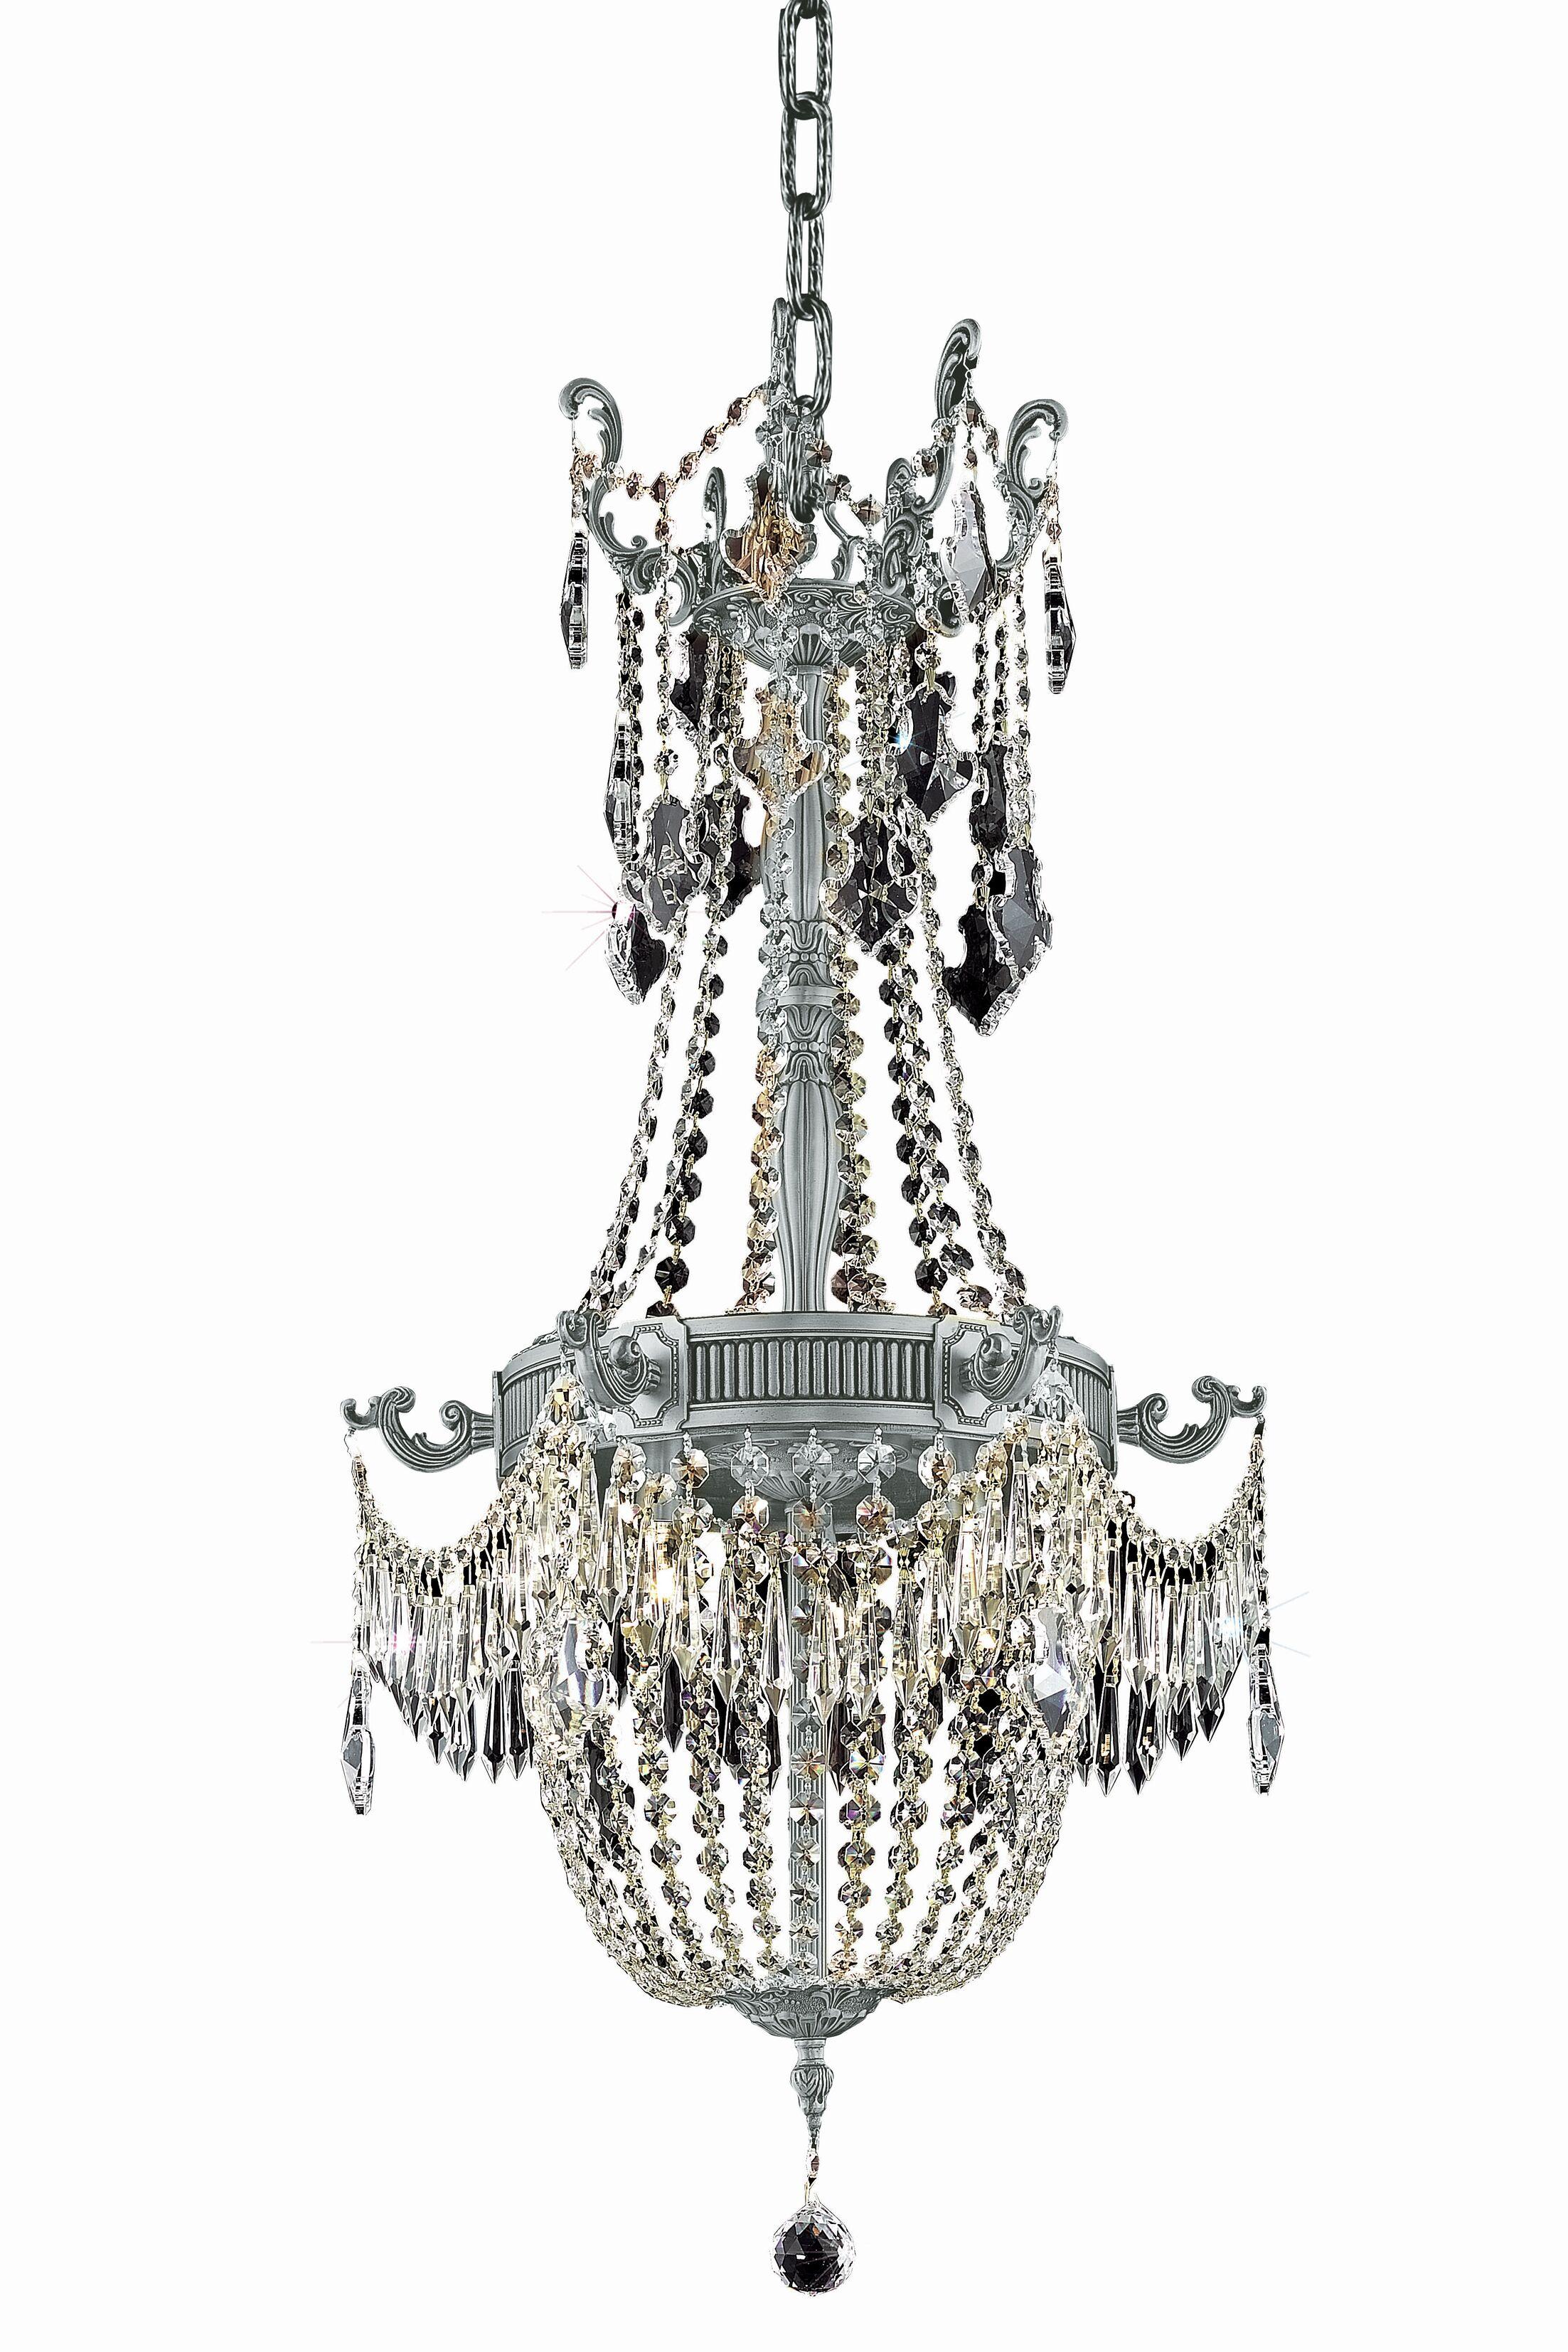 Ursula Traditional 6-Light Empire Chandelier Color: Dark Bronze, Crystal Grade: Swarovski Element